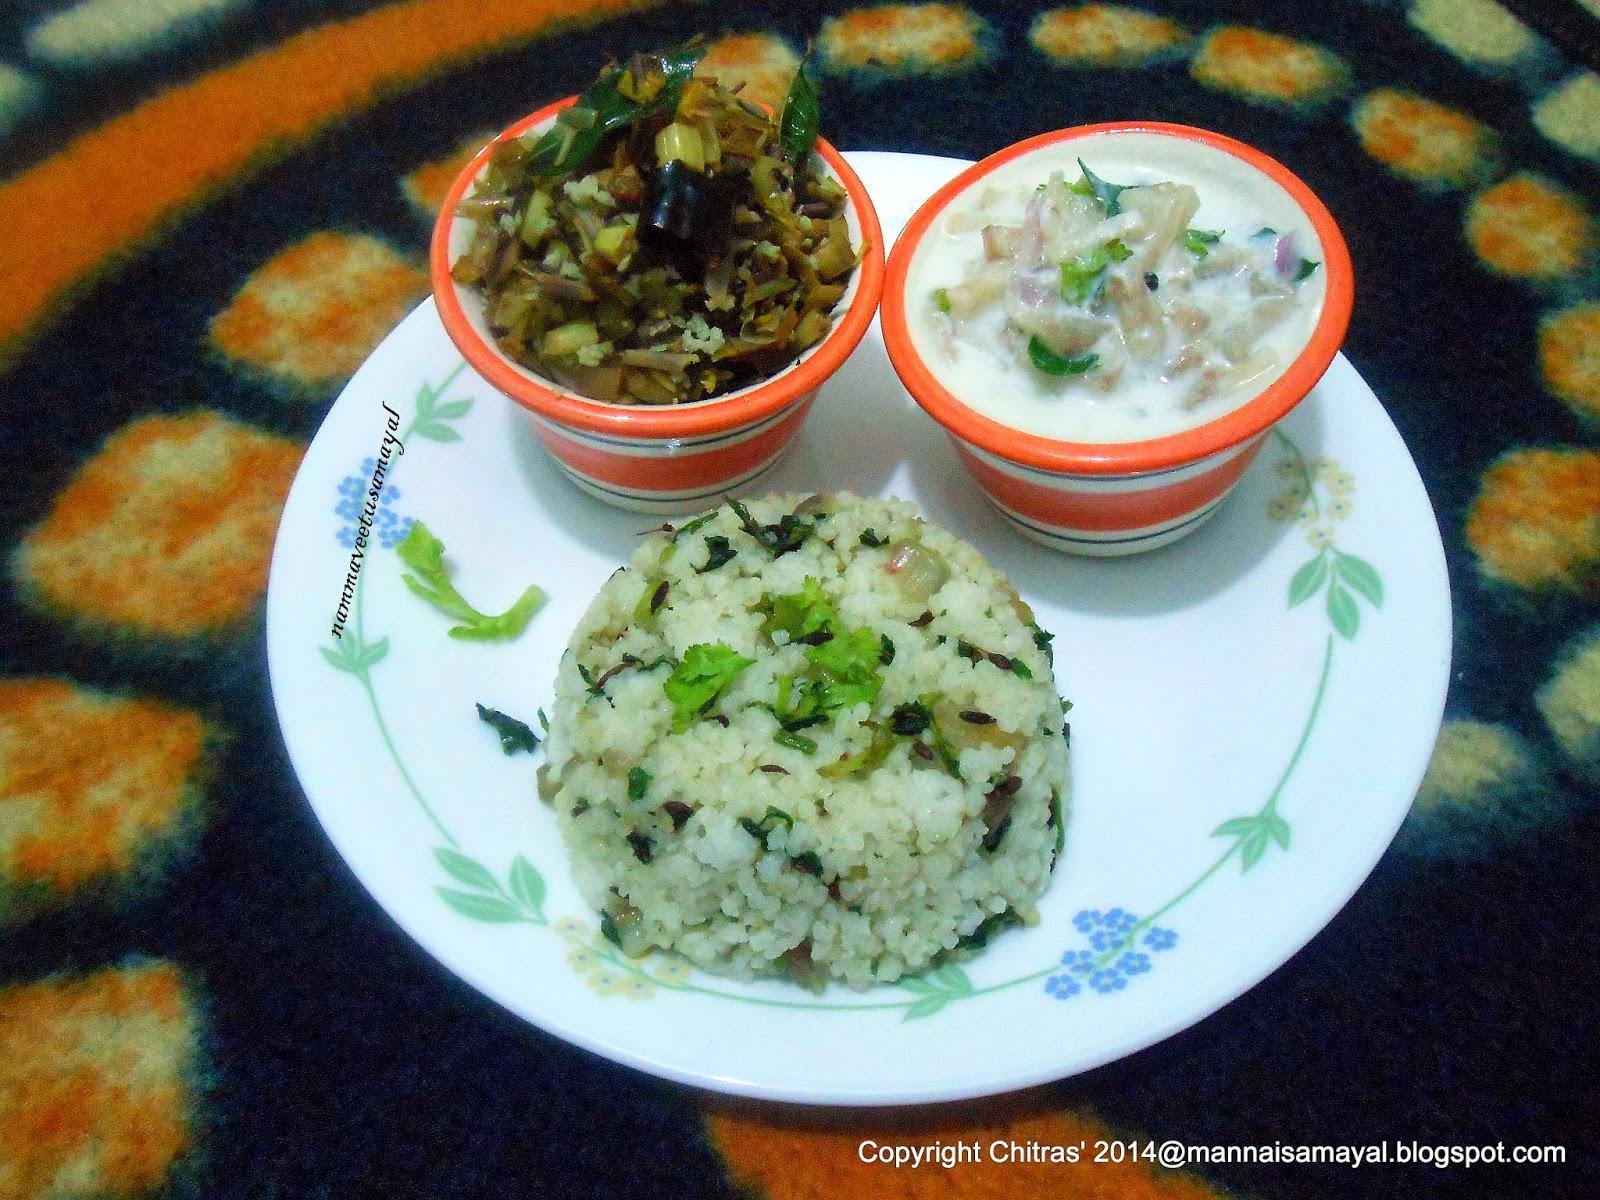 Kuthiraivaali Coriander Rice [ Barnyard Millet Coriander rice ]